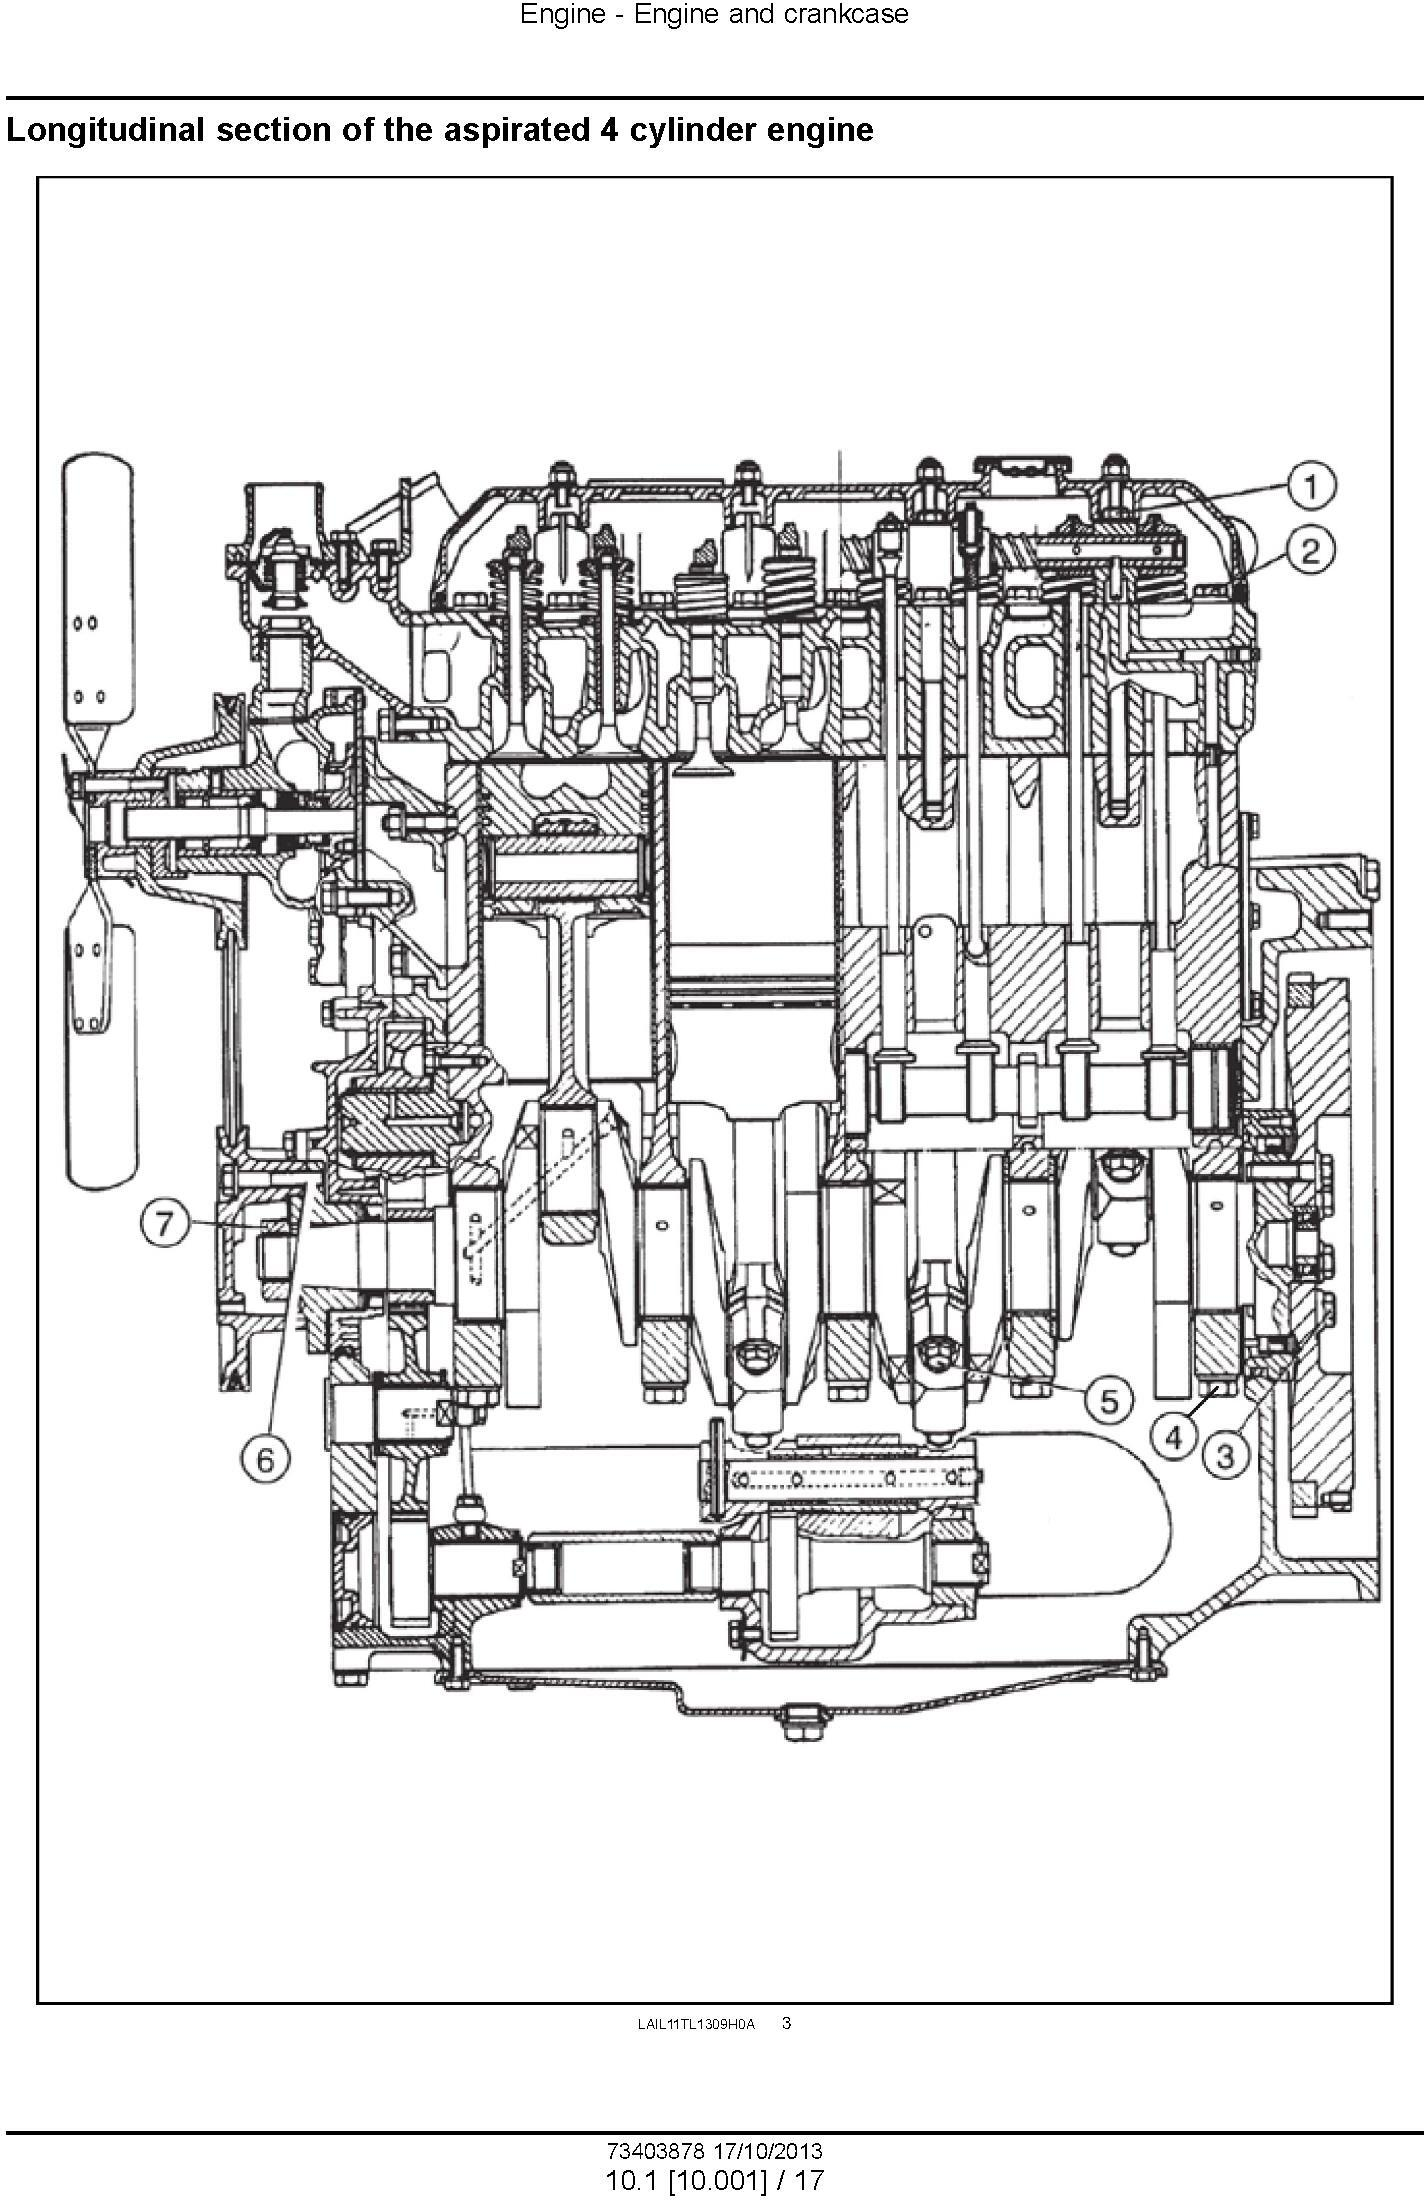 New Holland TT3840, TT3840F, TT3880F, TT4030 Tractors Service Manual - 1